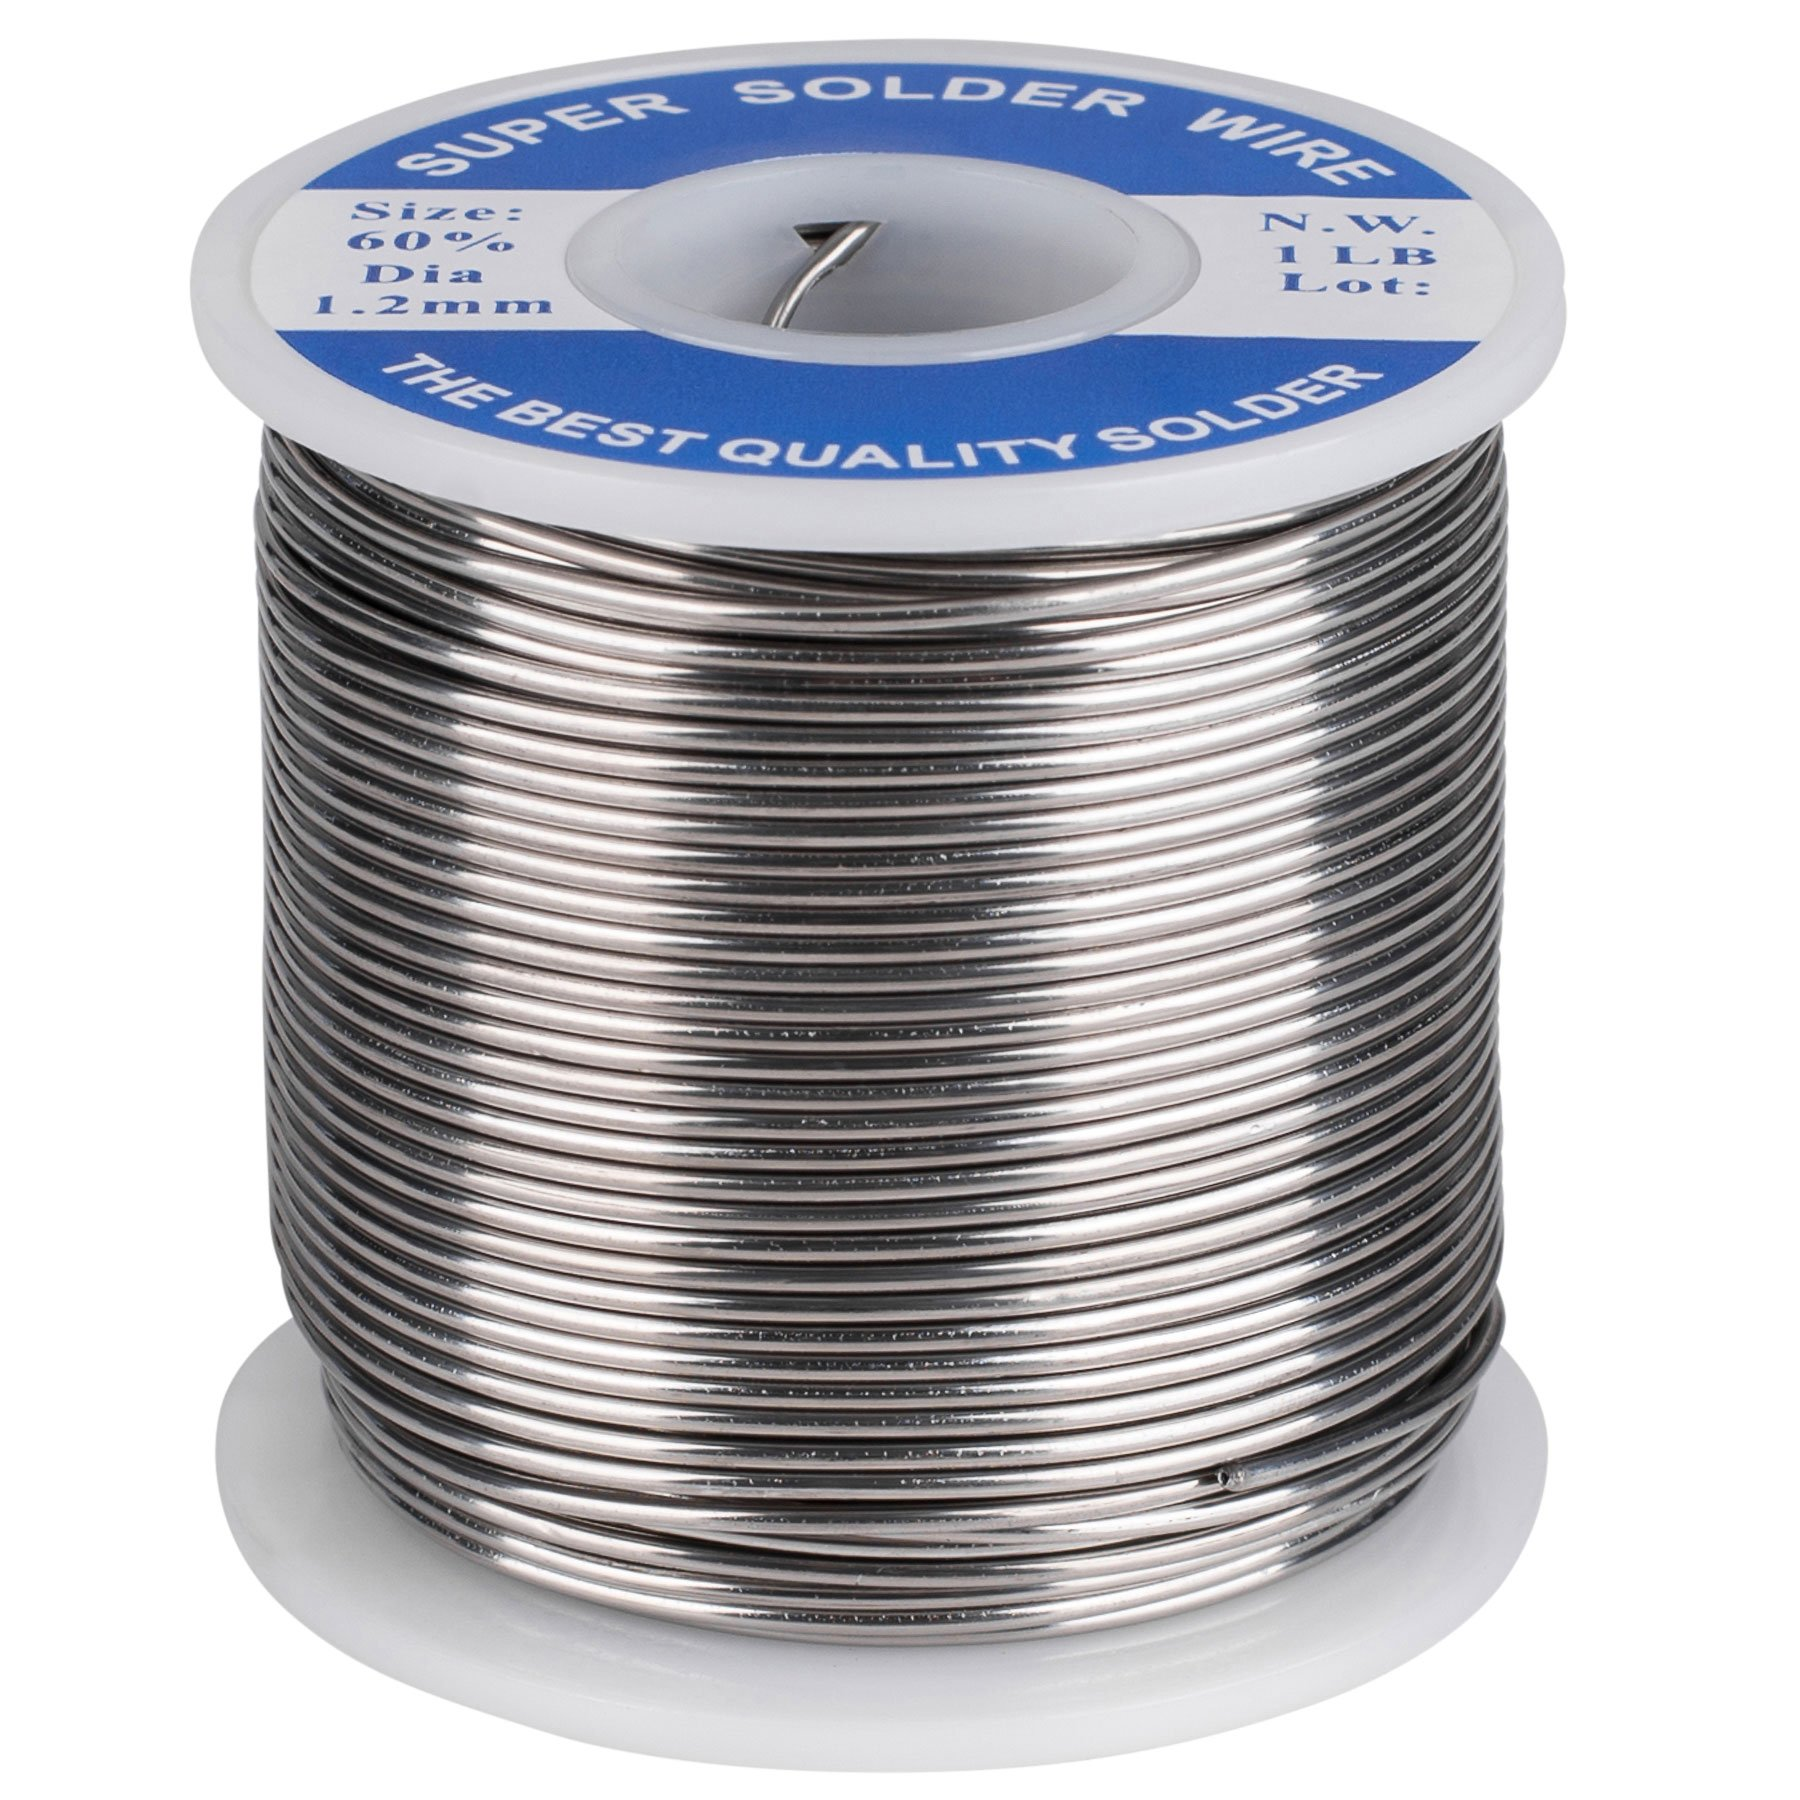 Parts Express Electronic Solder 60/40 1.2mm (0.050'') Diameter 1 lb. Spool